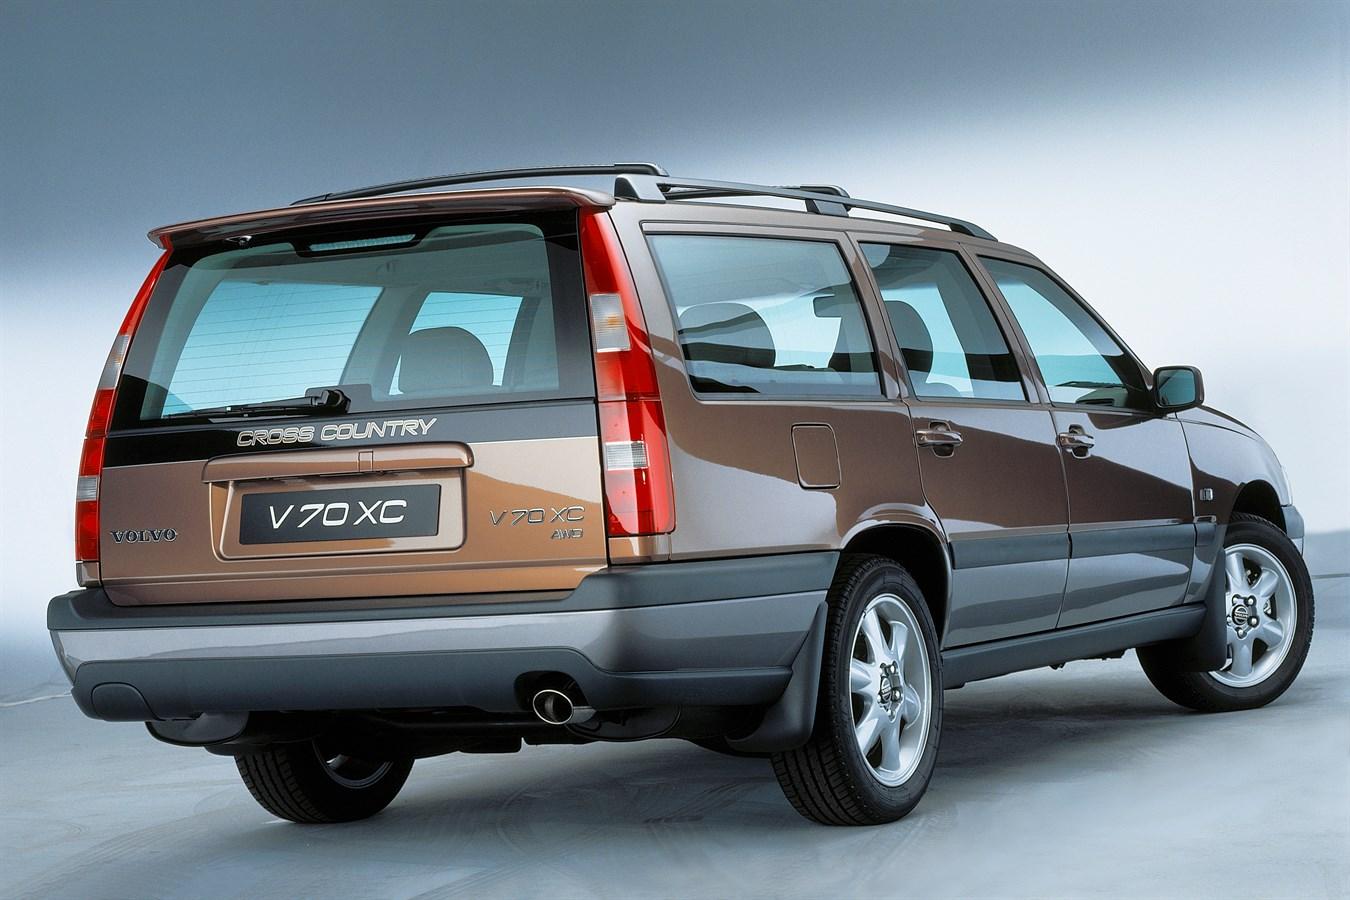 Volvo v70 xc cross country